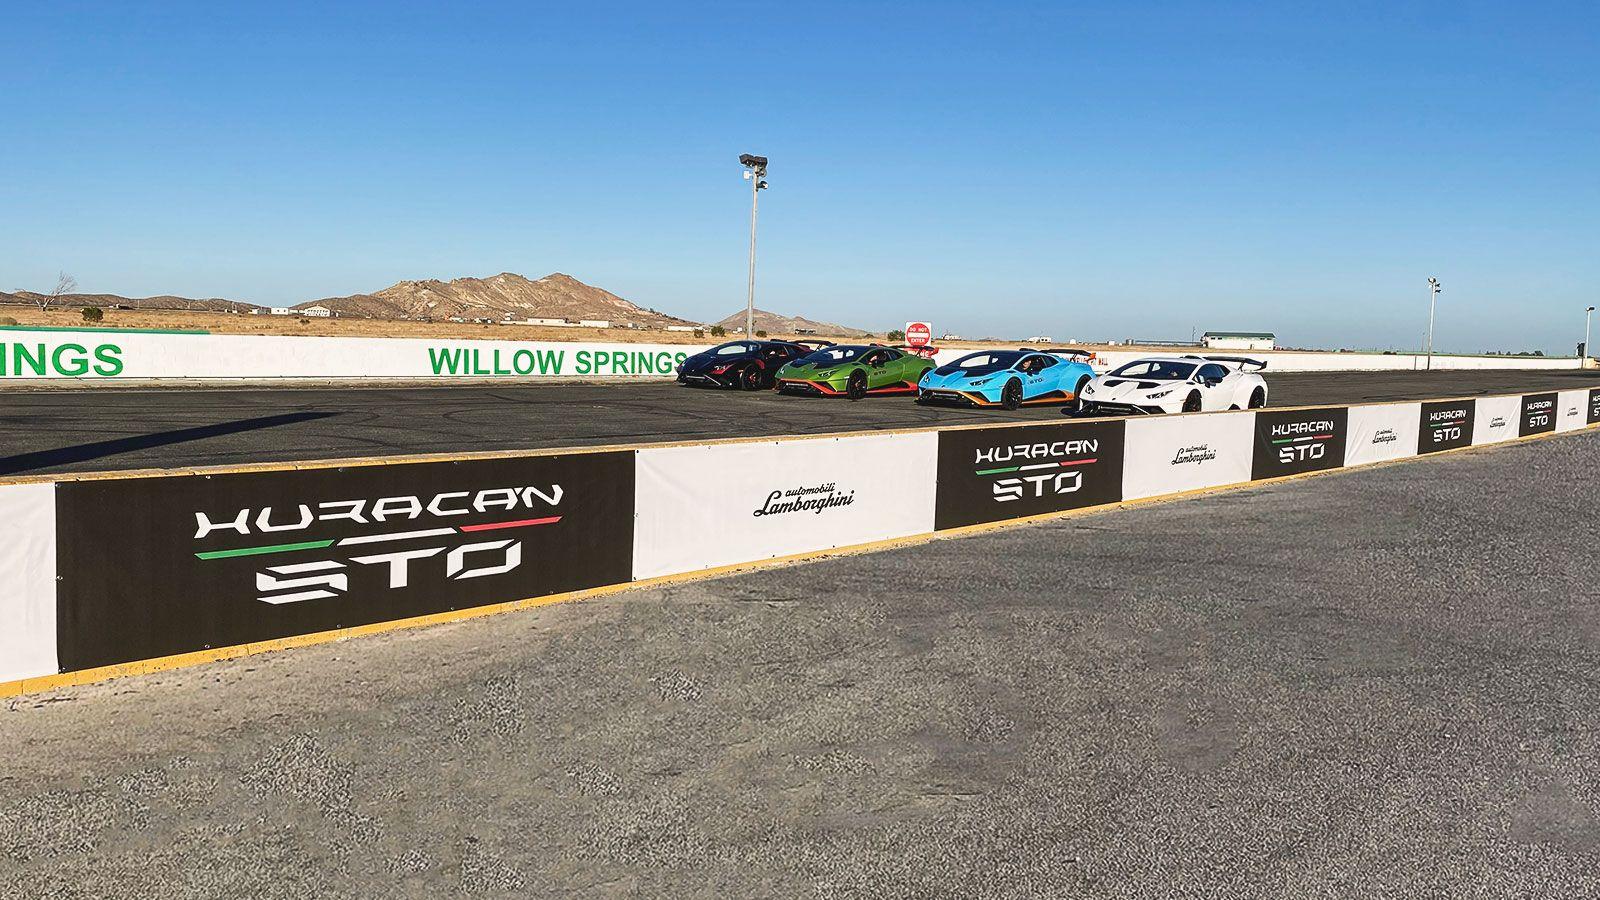 Lamborghini raceway vinyl banners